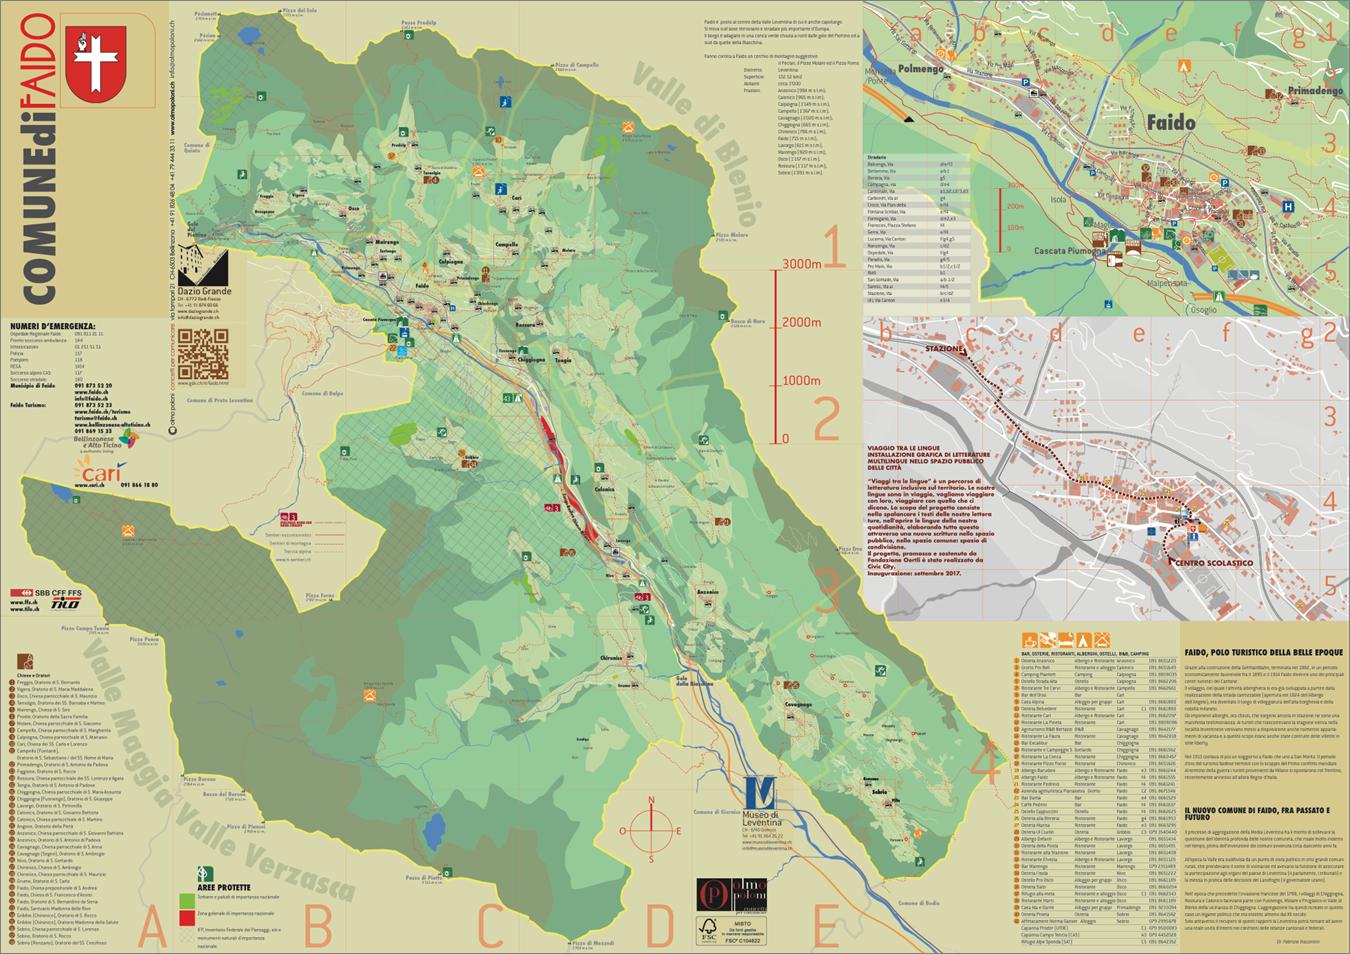 29giugno cartina di faido incompleta vedi interpell deperon cc